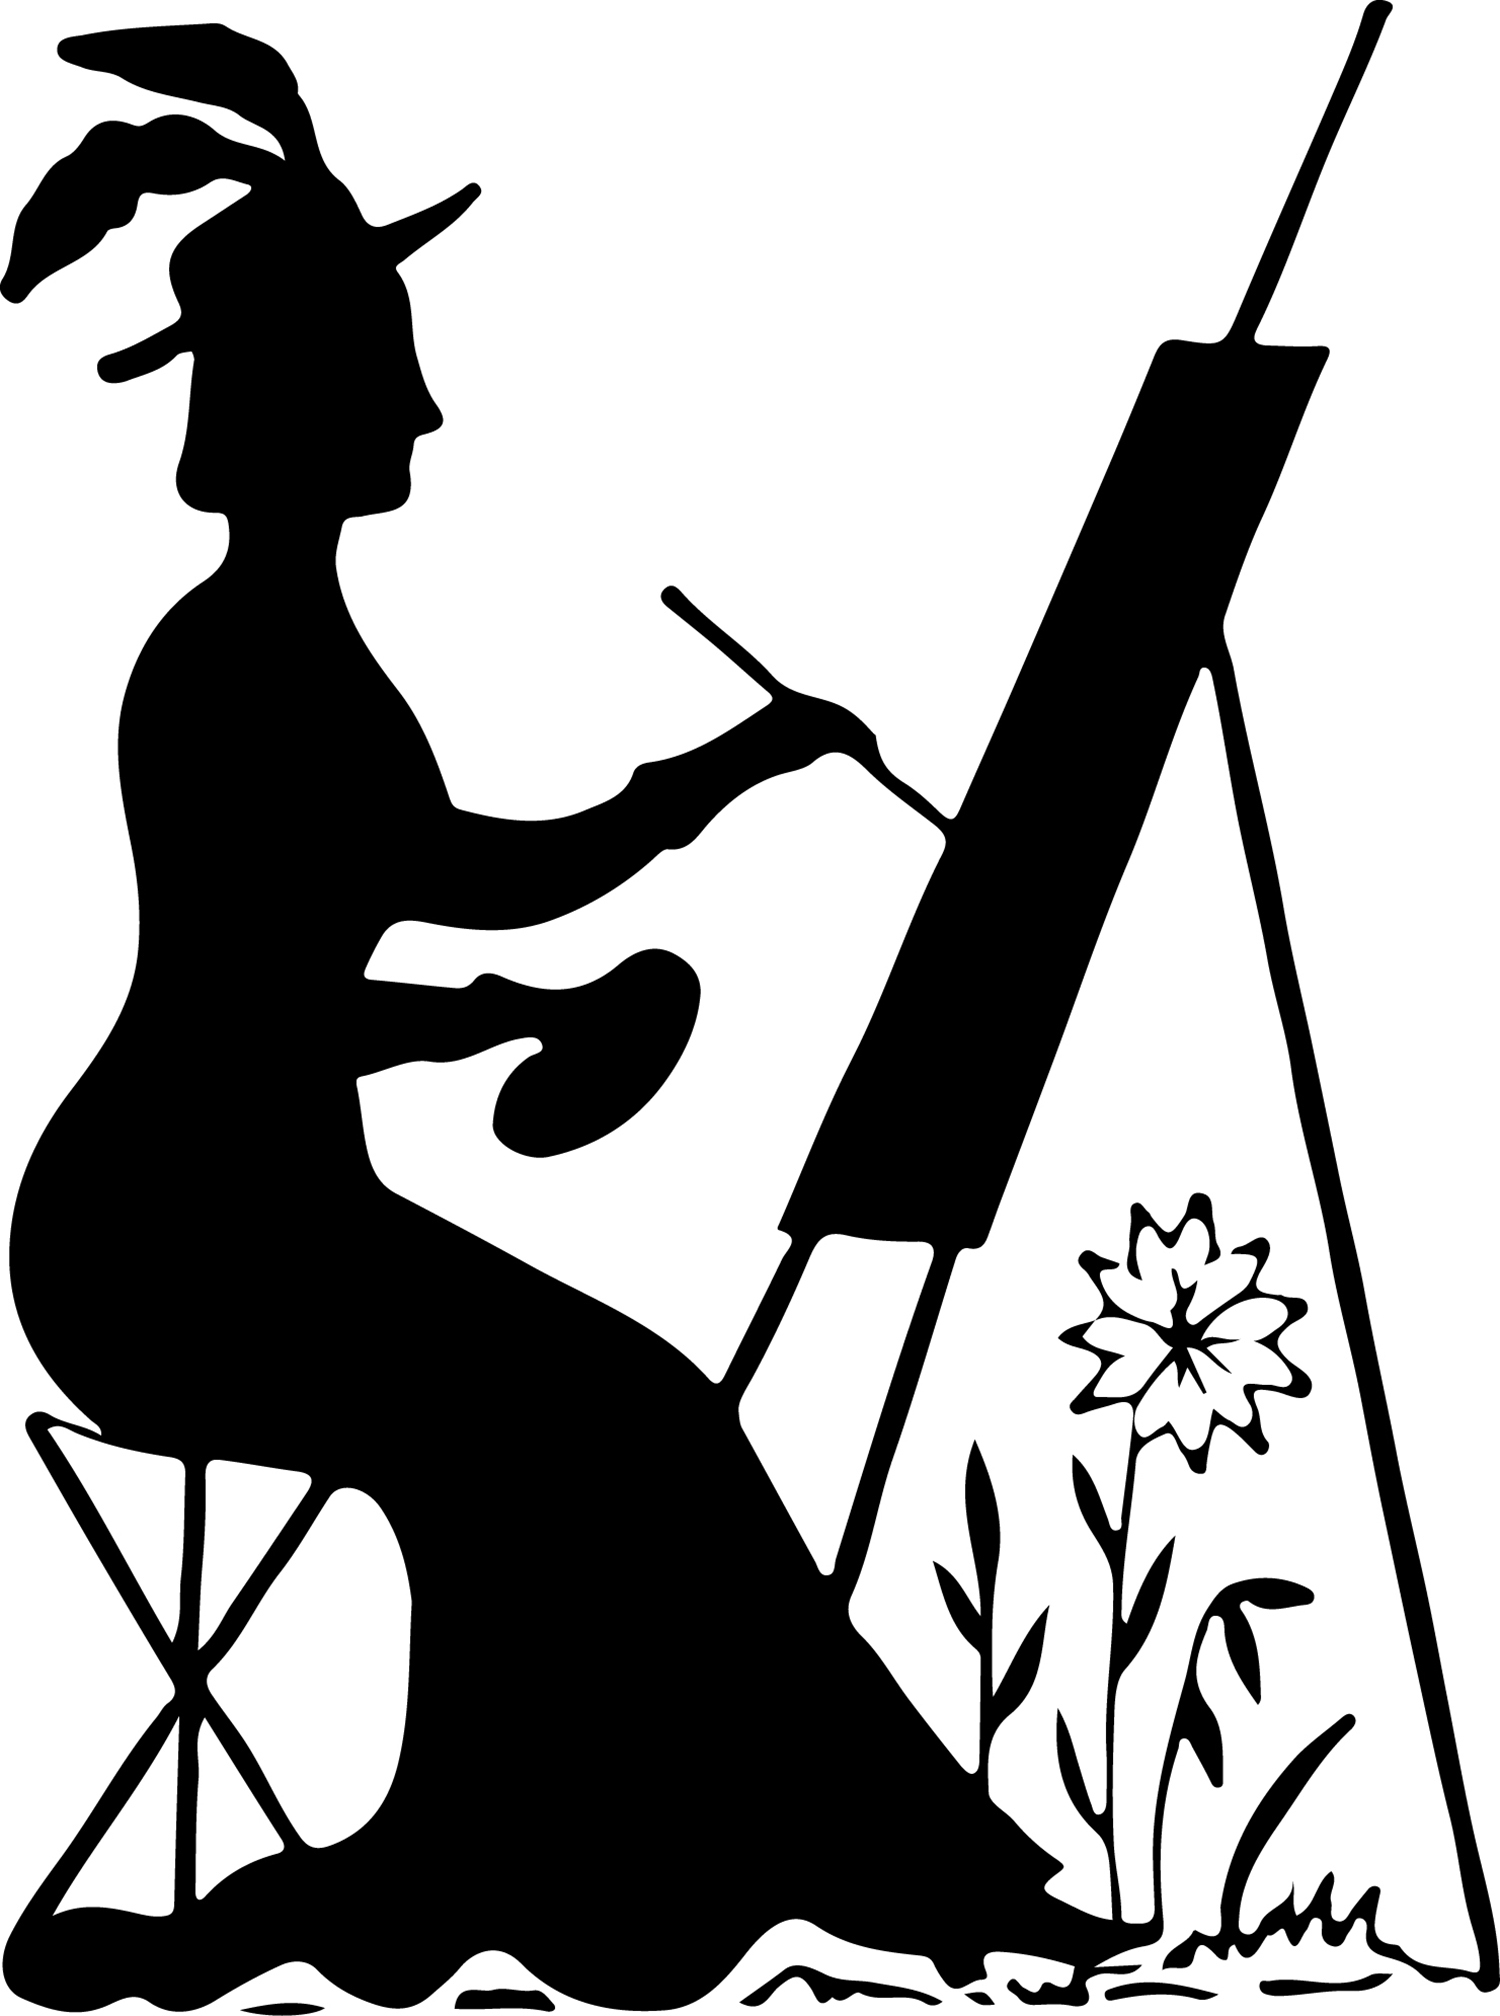 Art Silhouette.